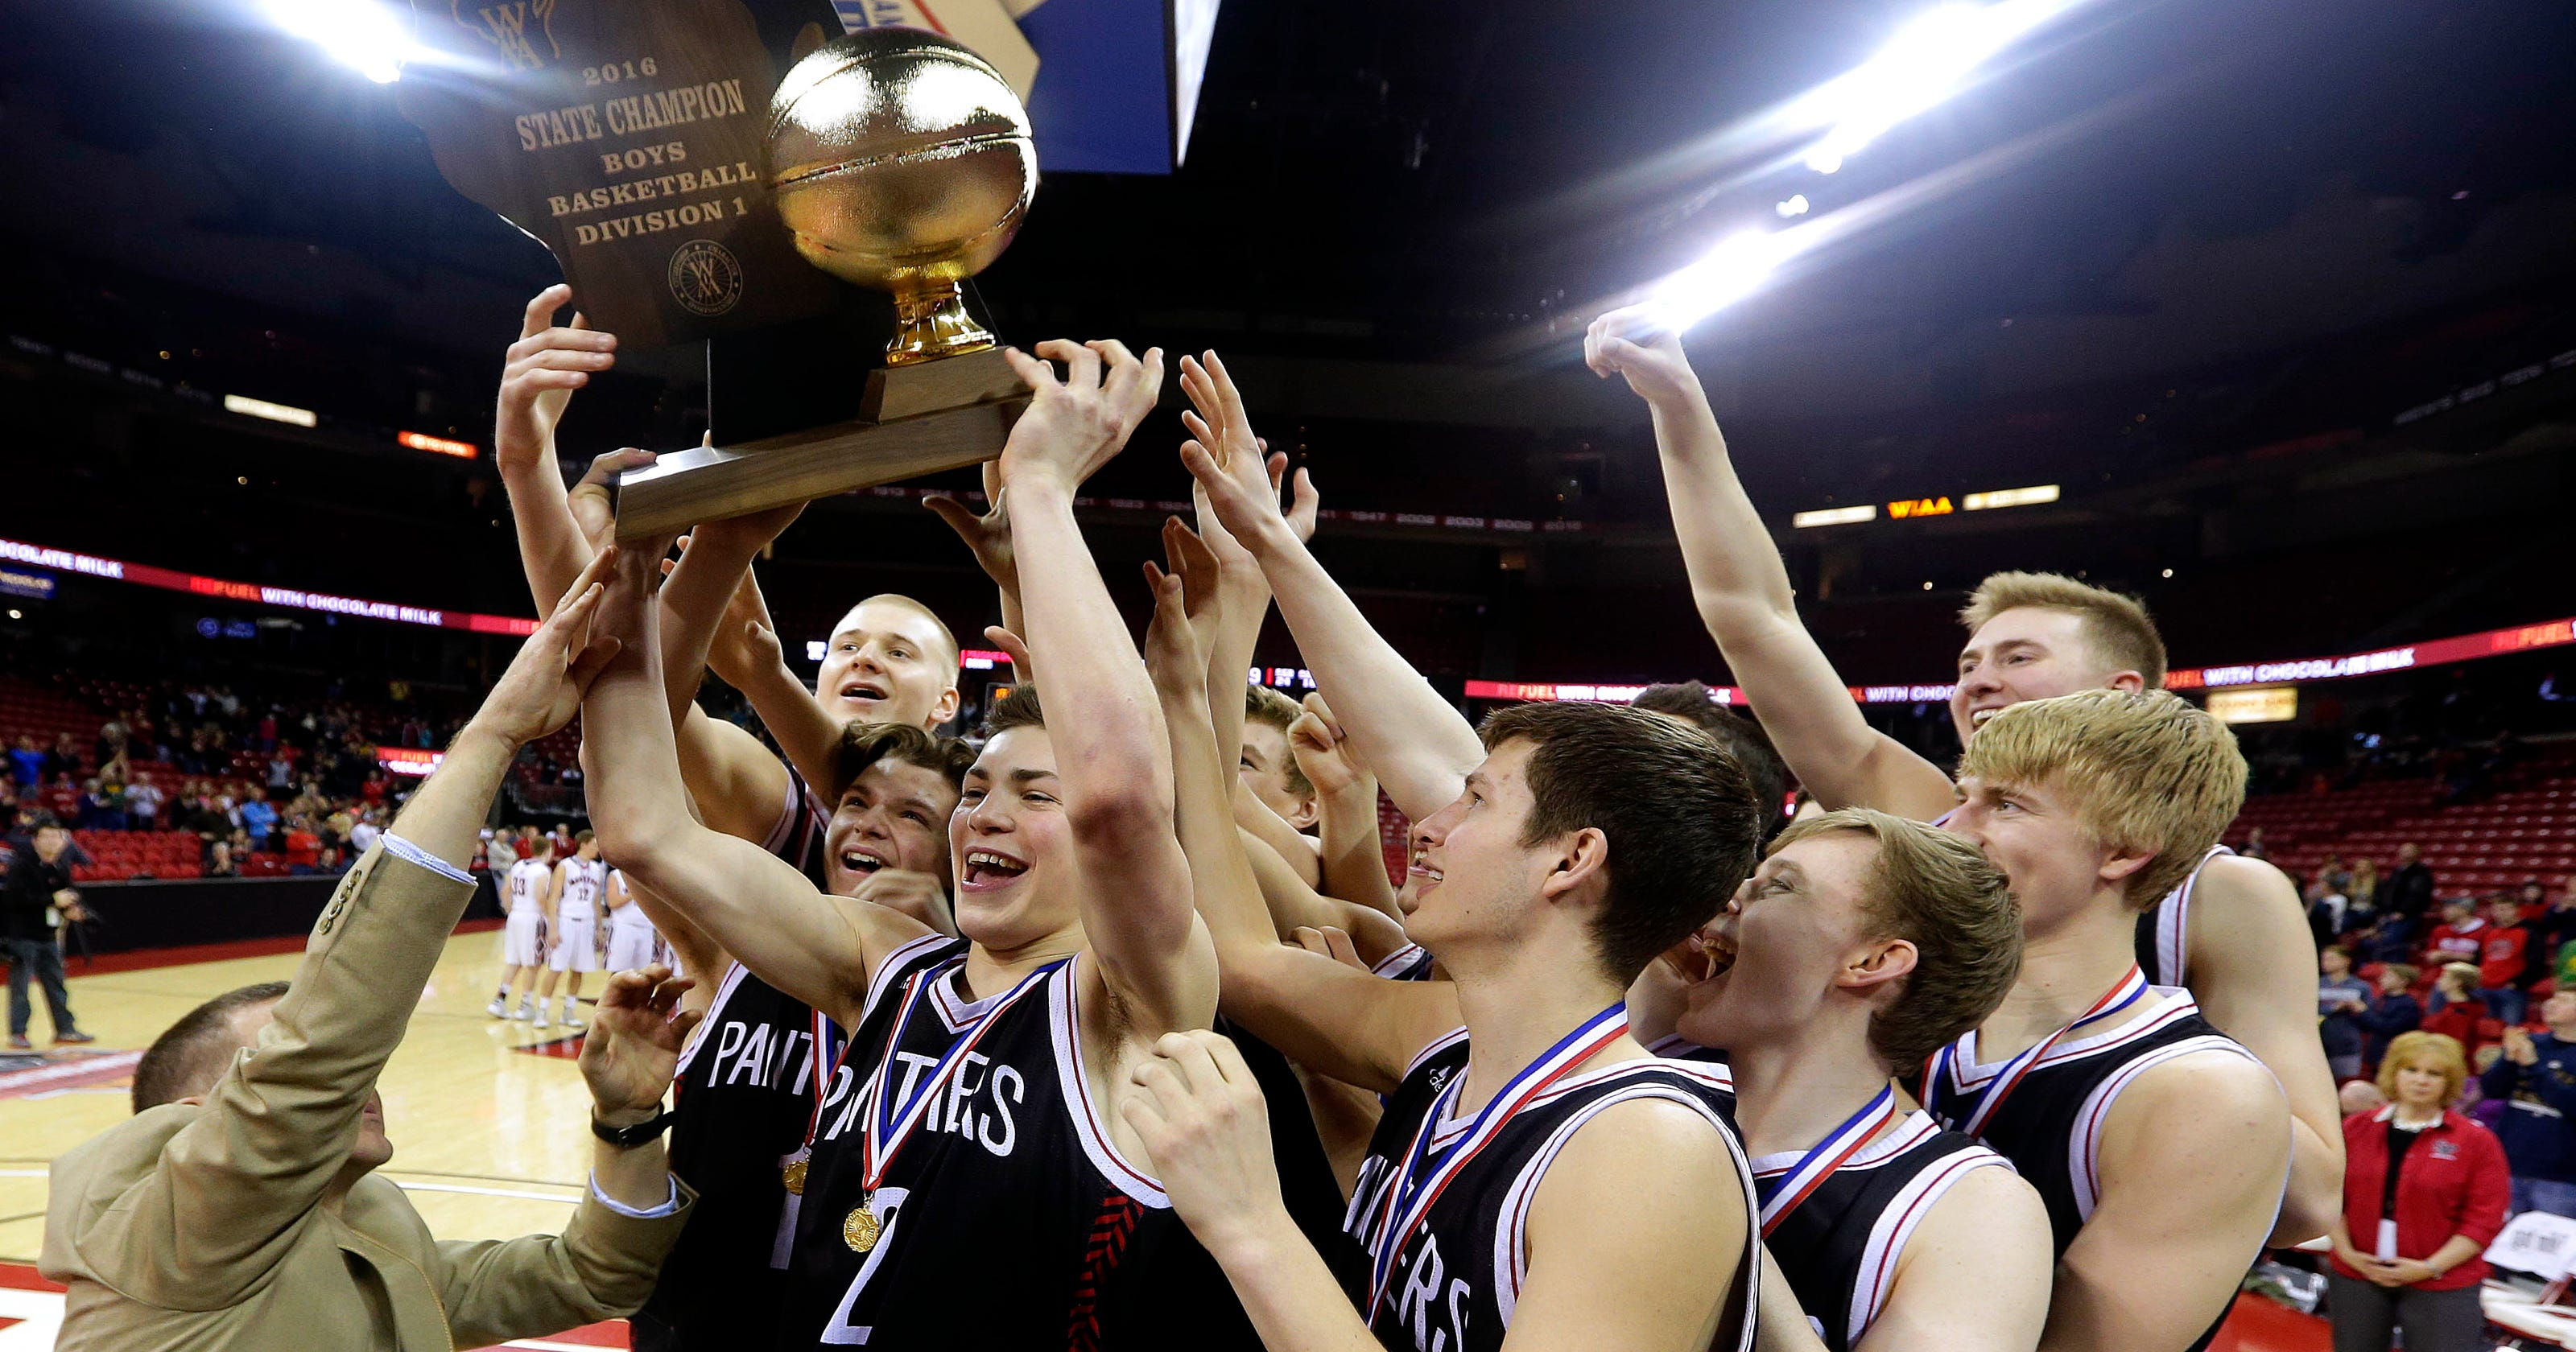 a915ec42ac9 2017 WIAA state boys basketball tournament preview